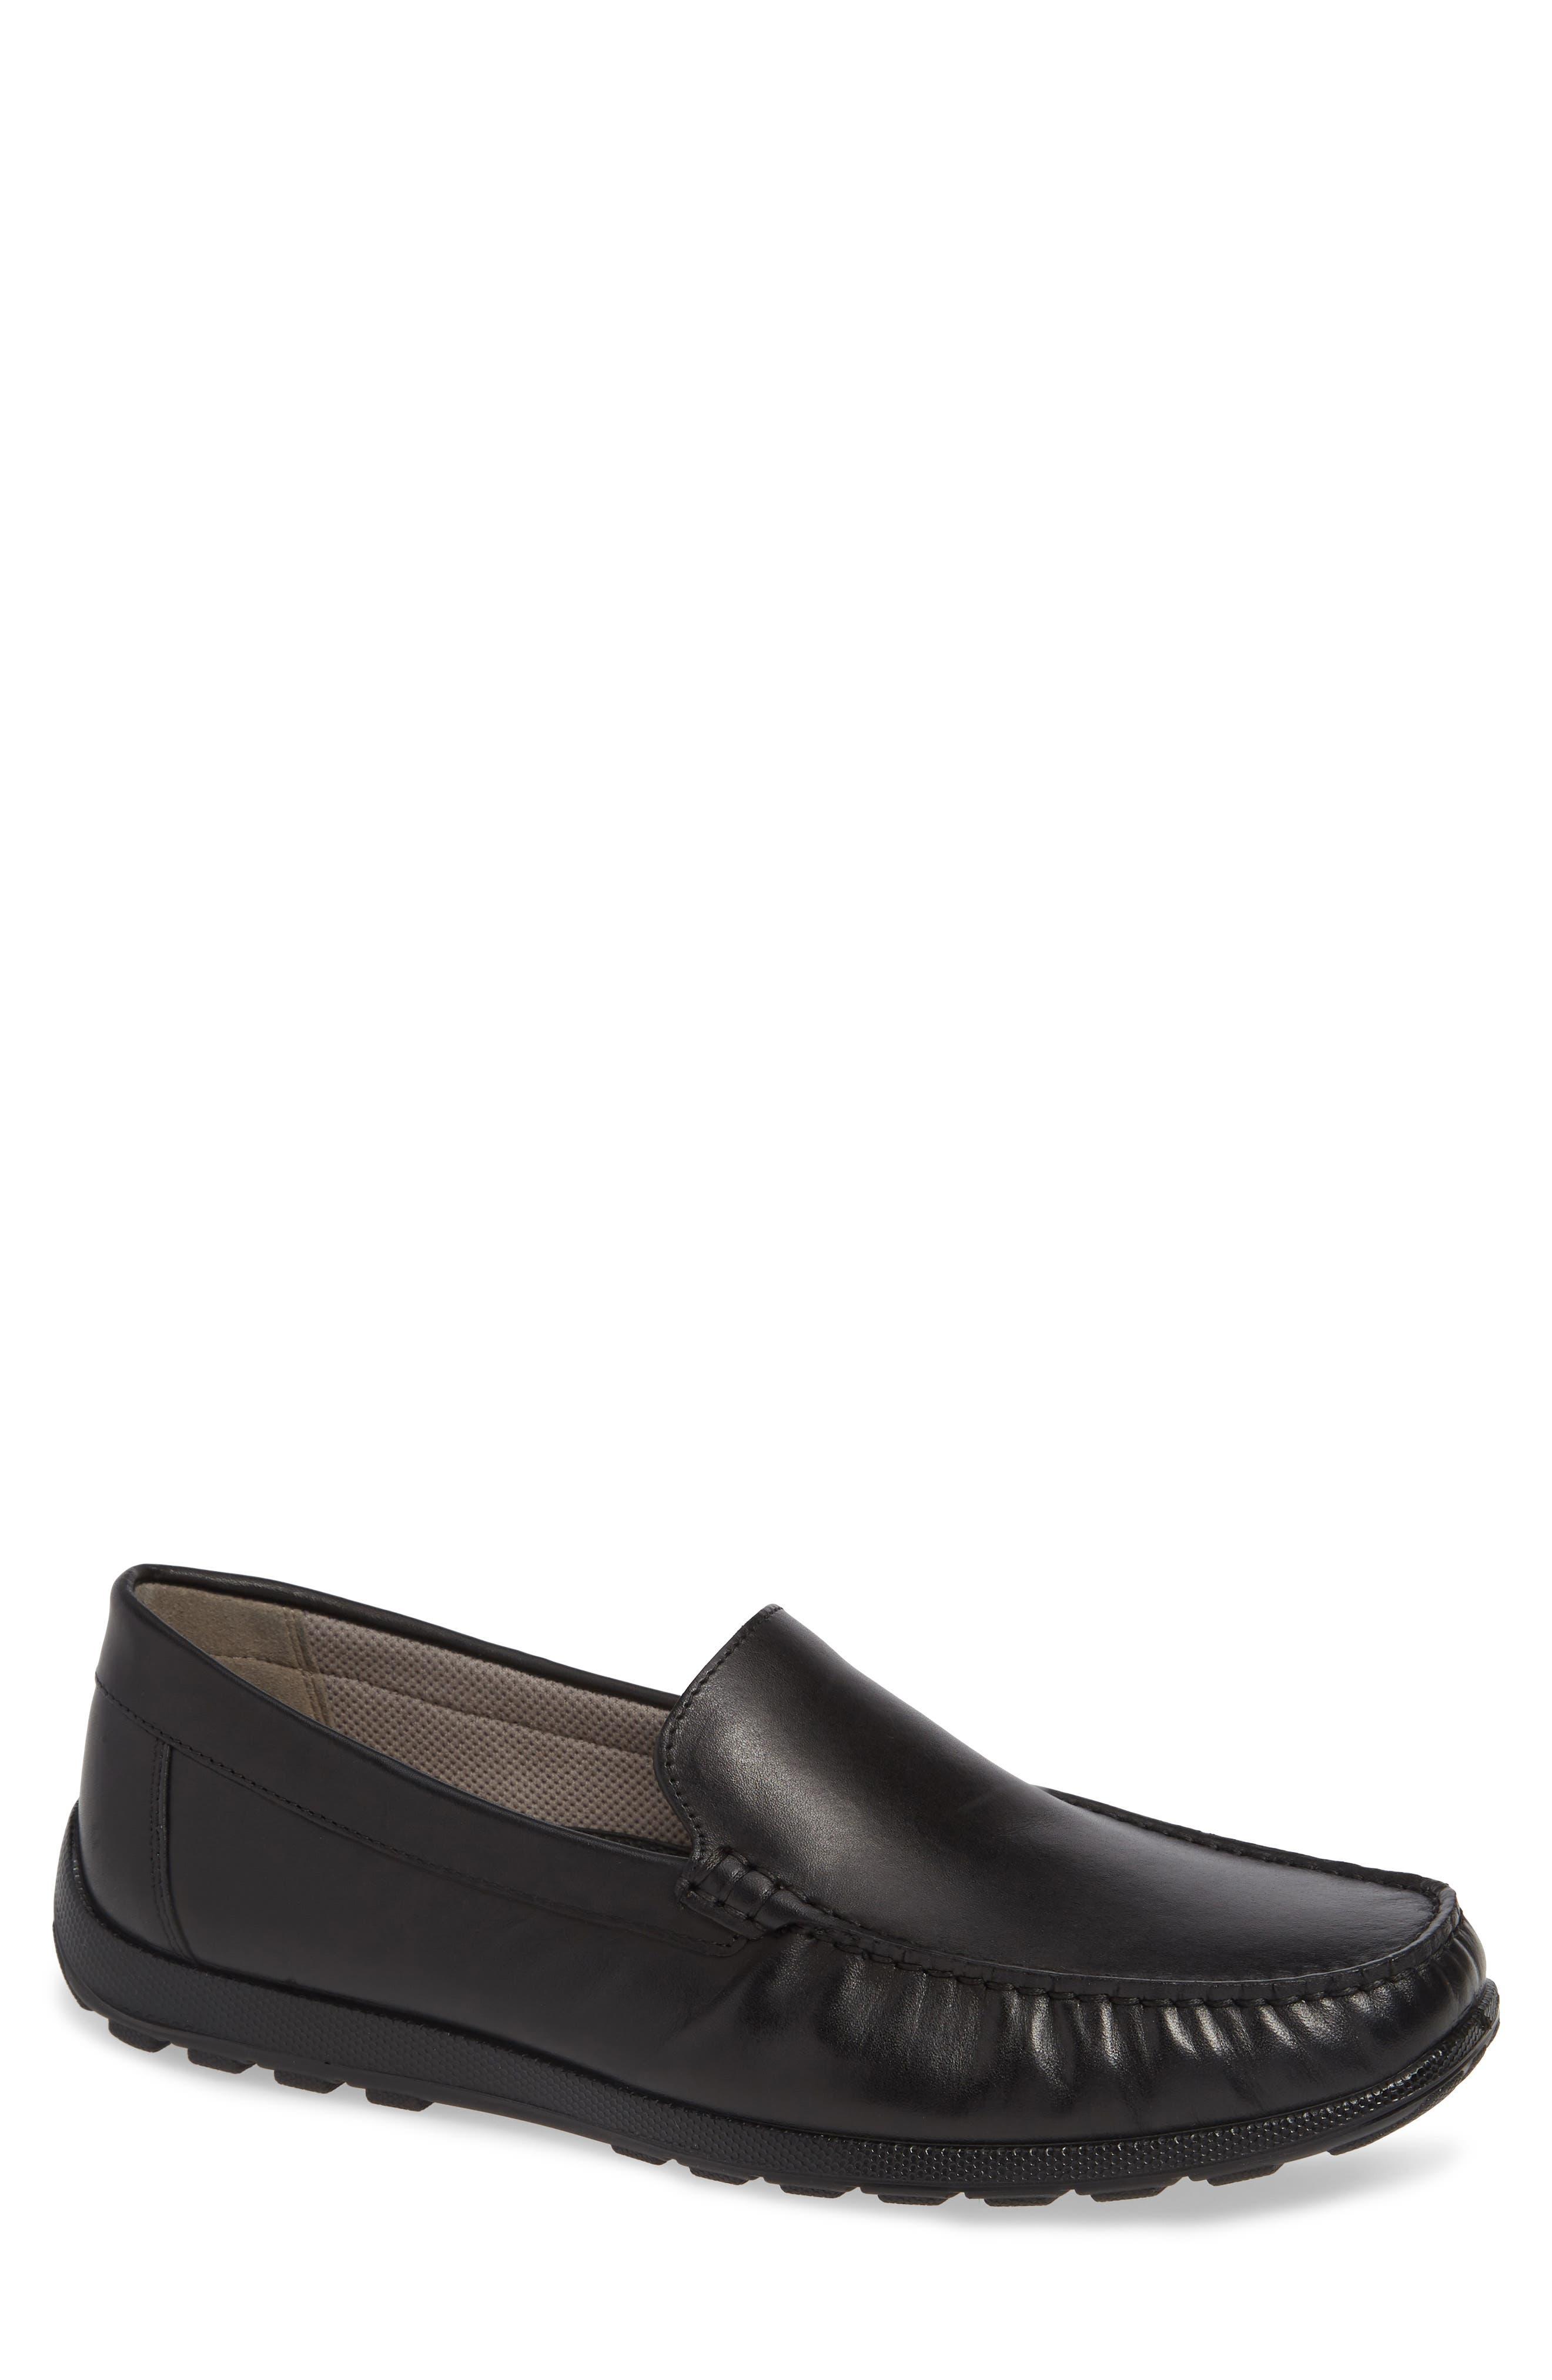 Reciprico Driving Shoe,                         Main,                         color, BLACK LEATHER